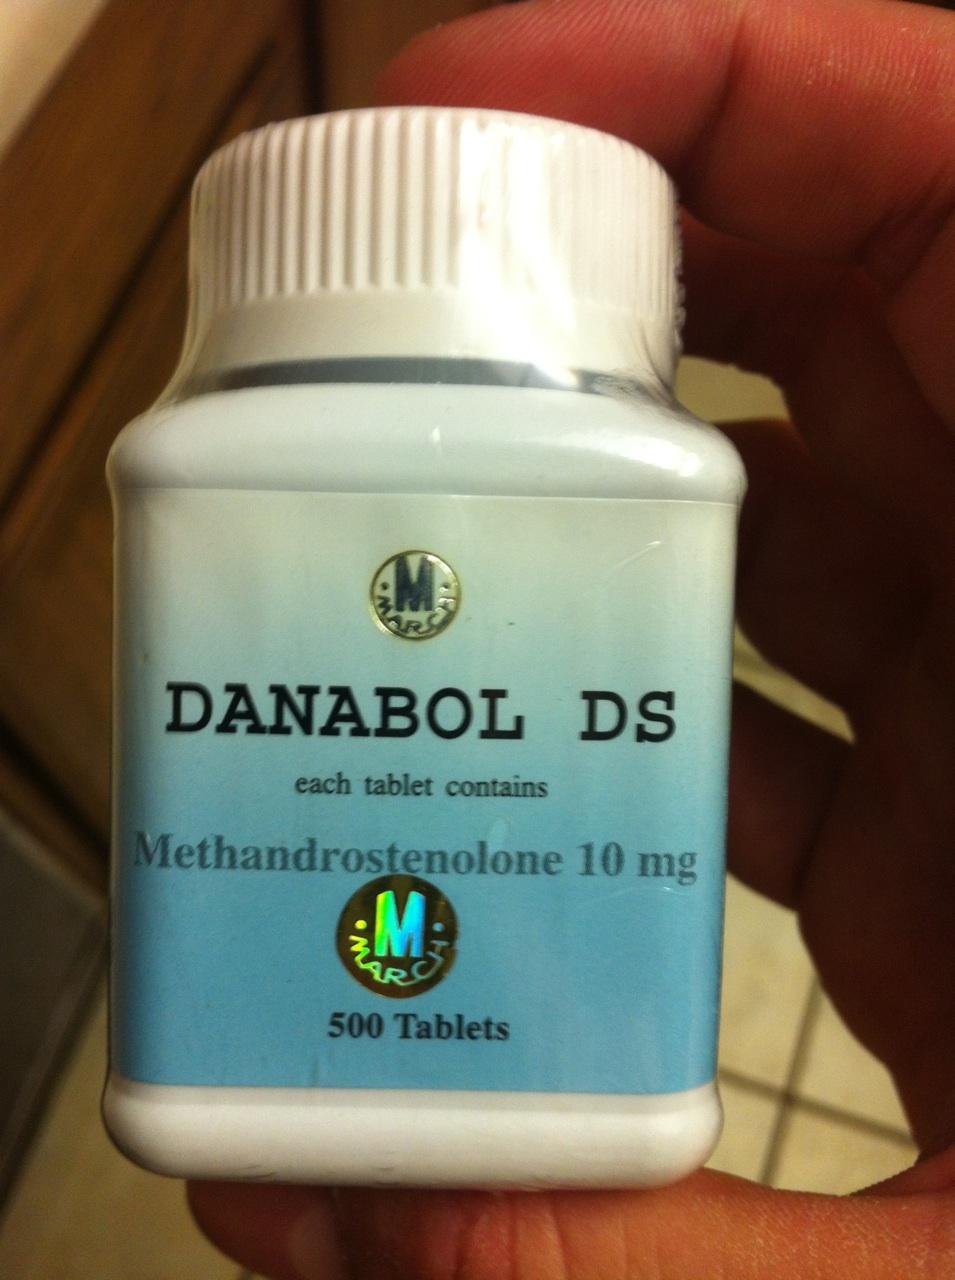 dianabols 10mg